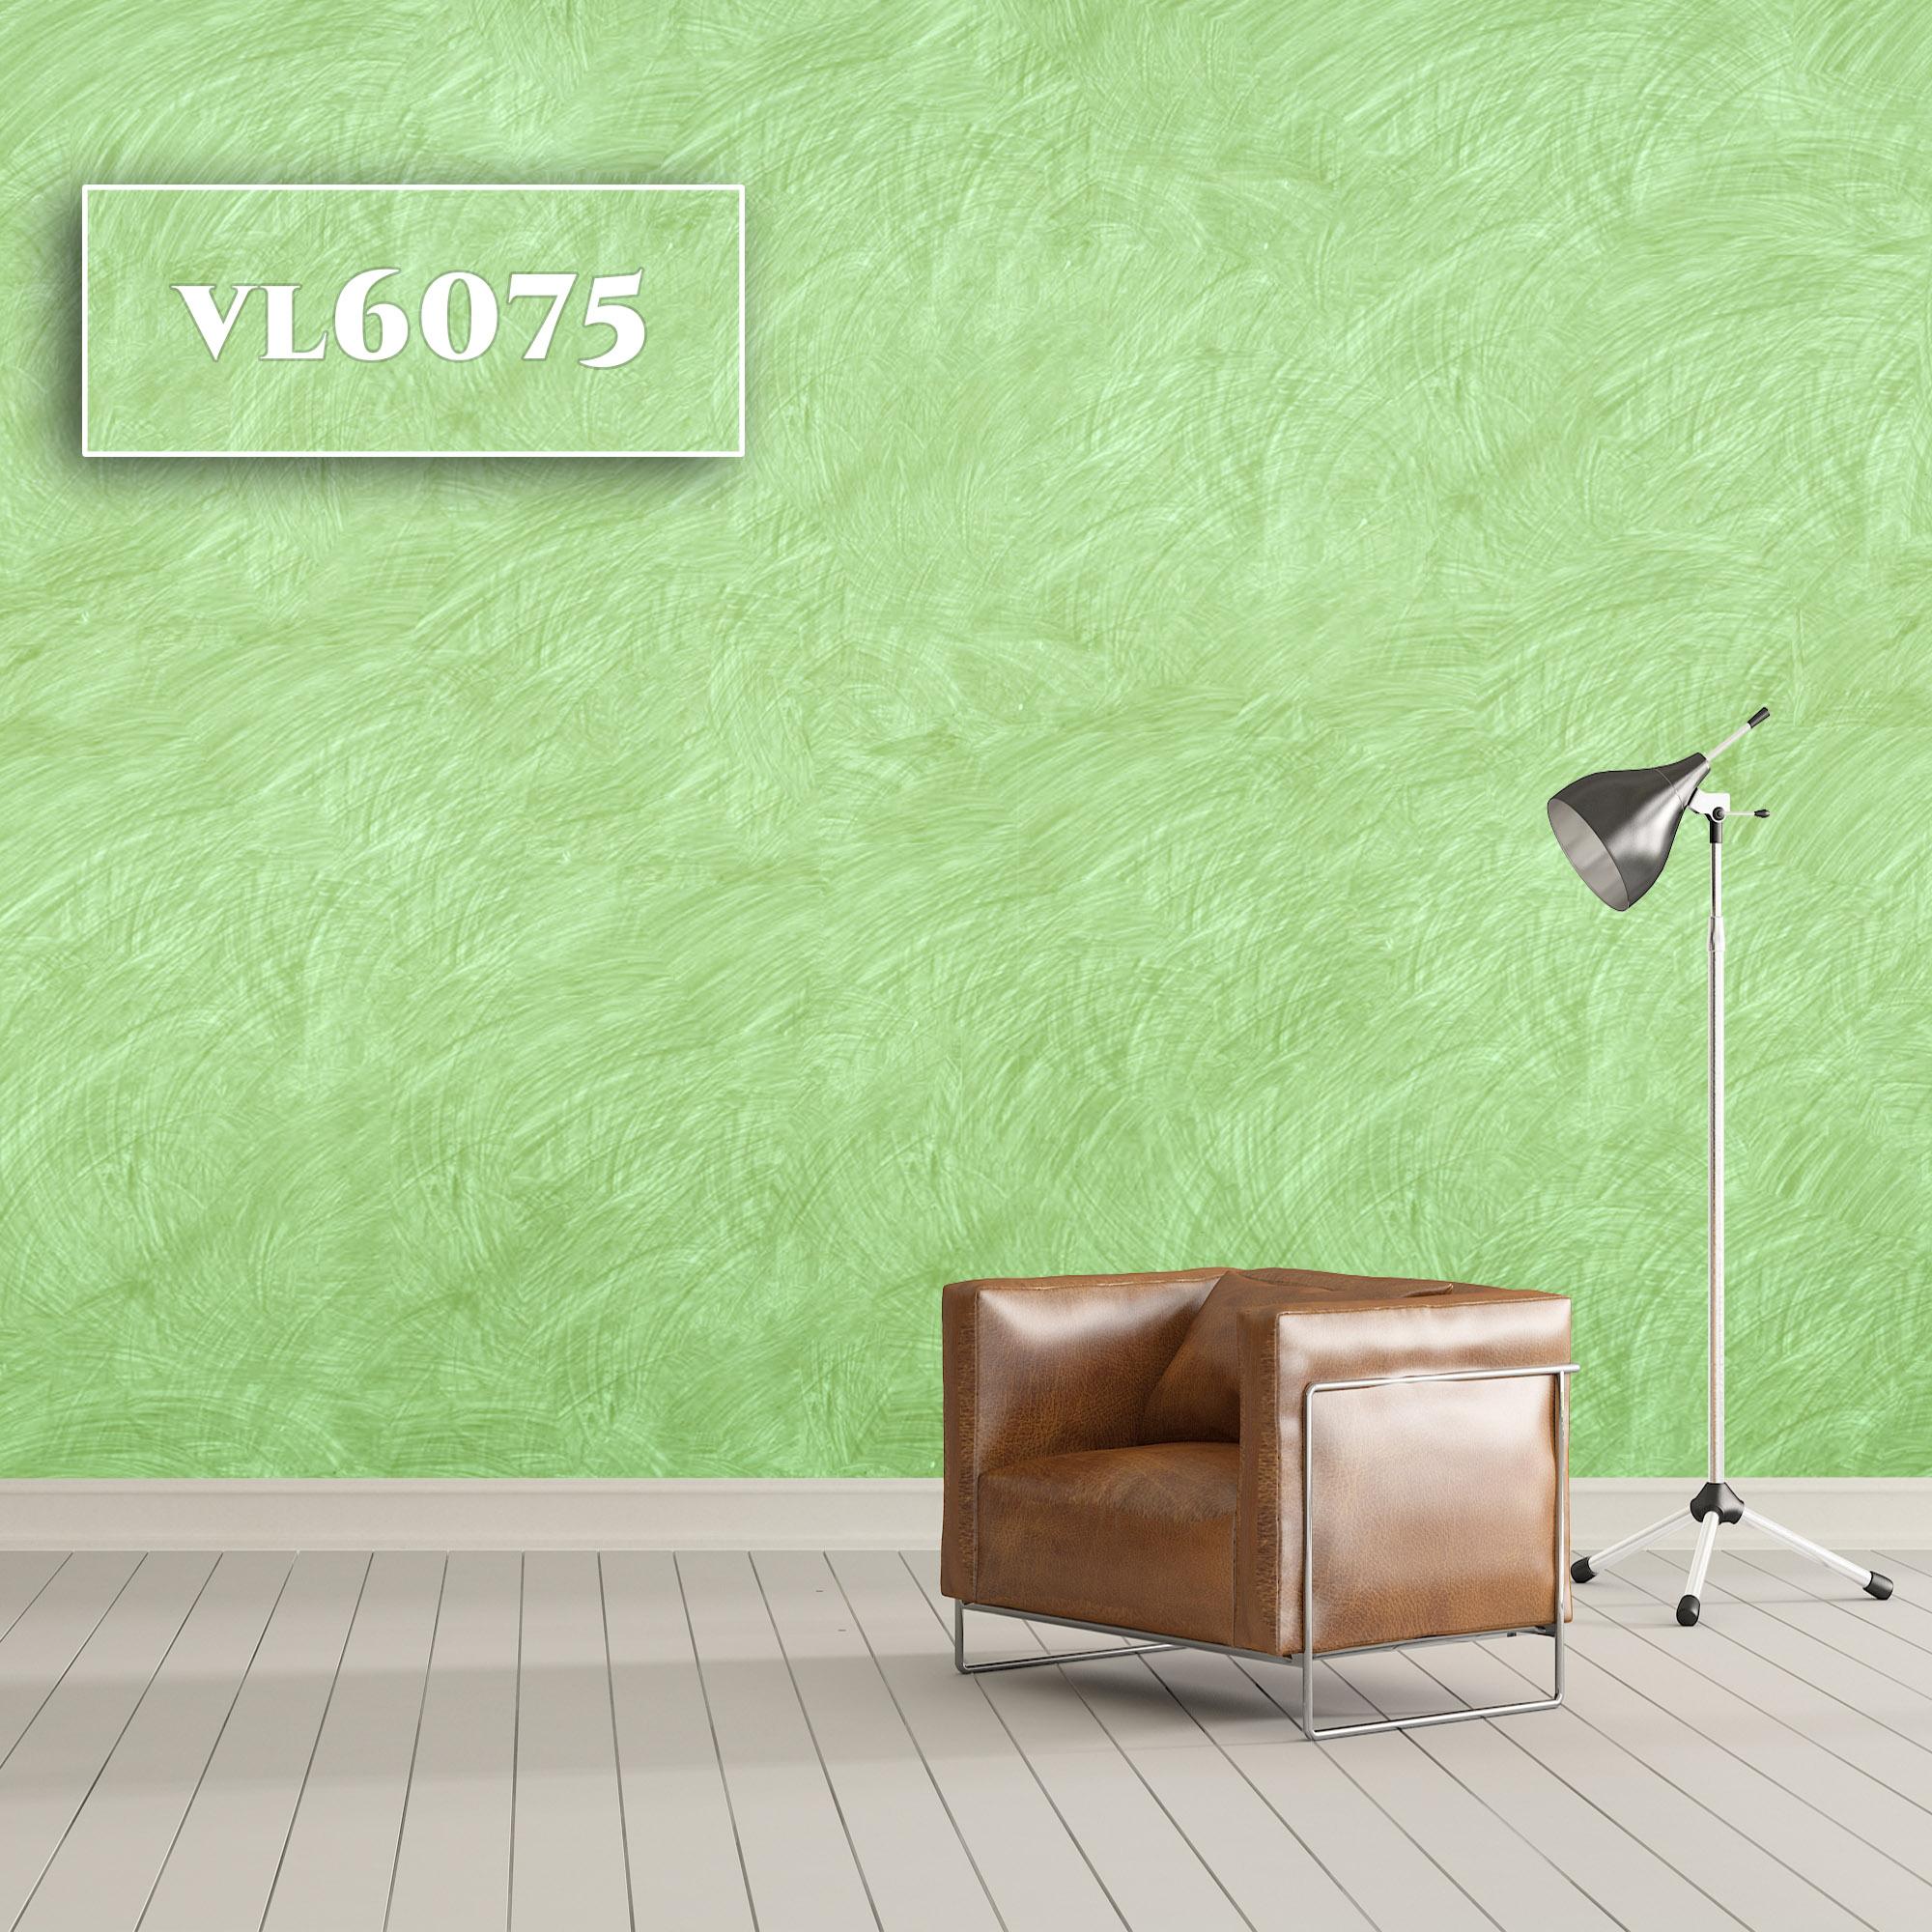 VL6075